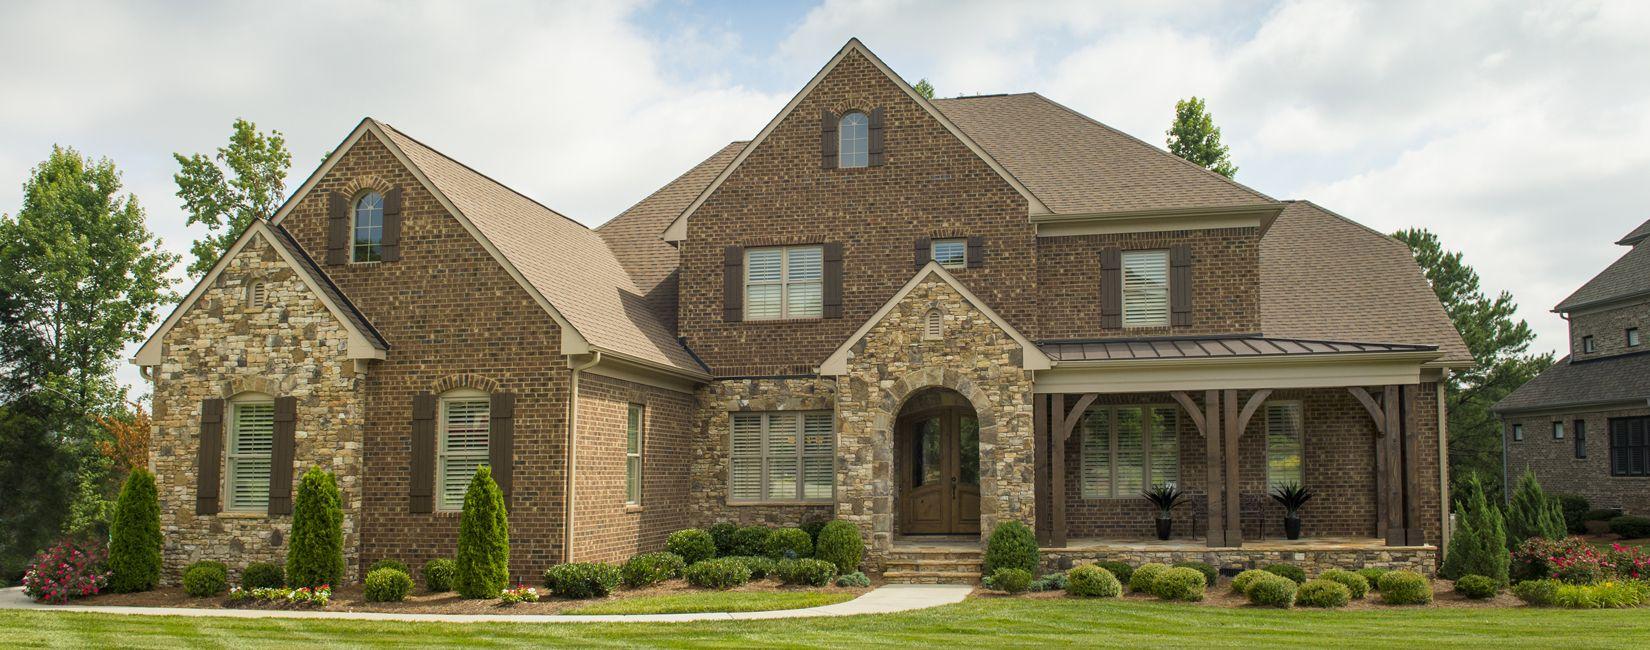 HARTS LANDMARK Homes 45 when complete Built new